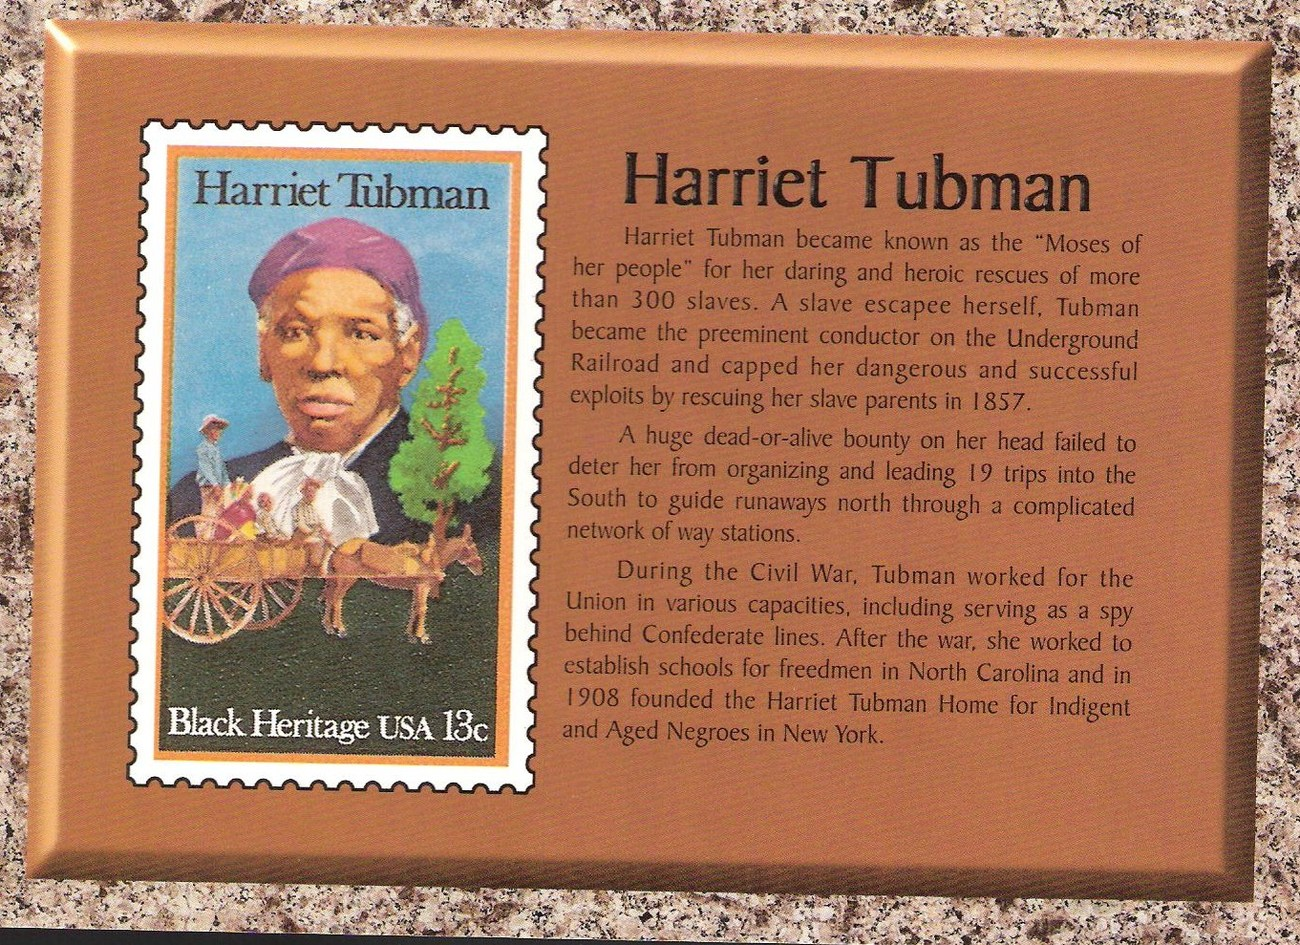 20 Jumbo Stamp Image Postcards Celebrating Black Heritage (V